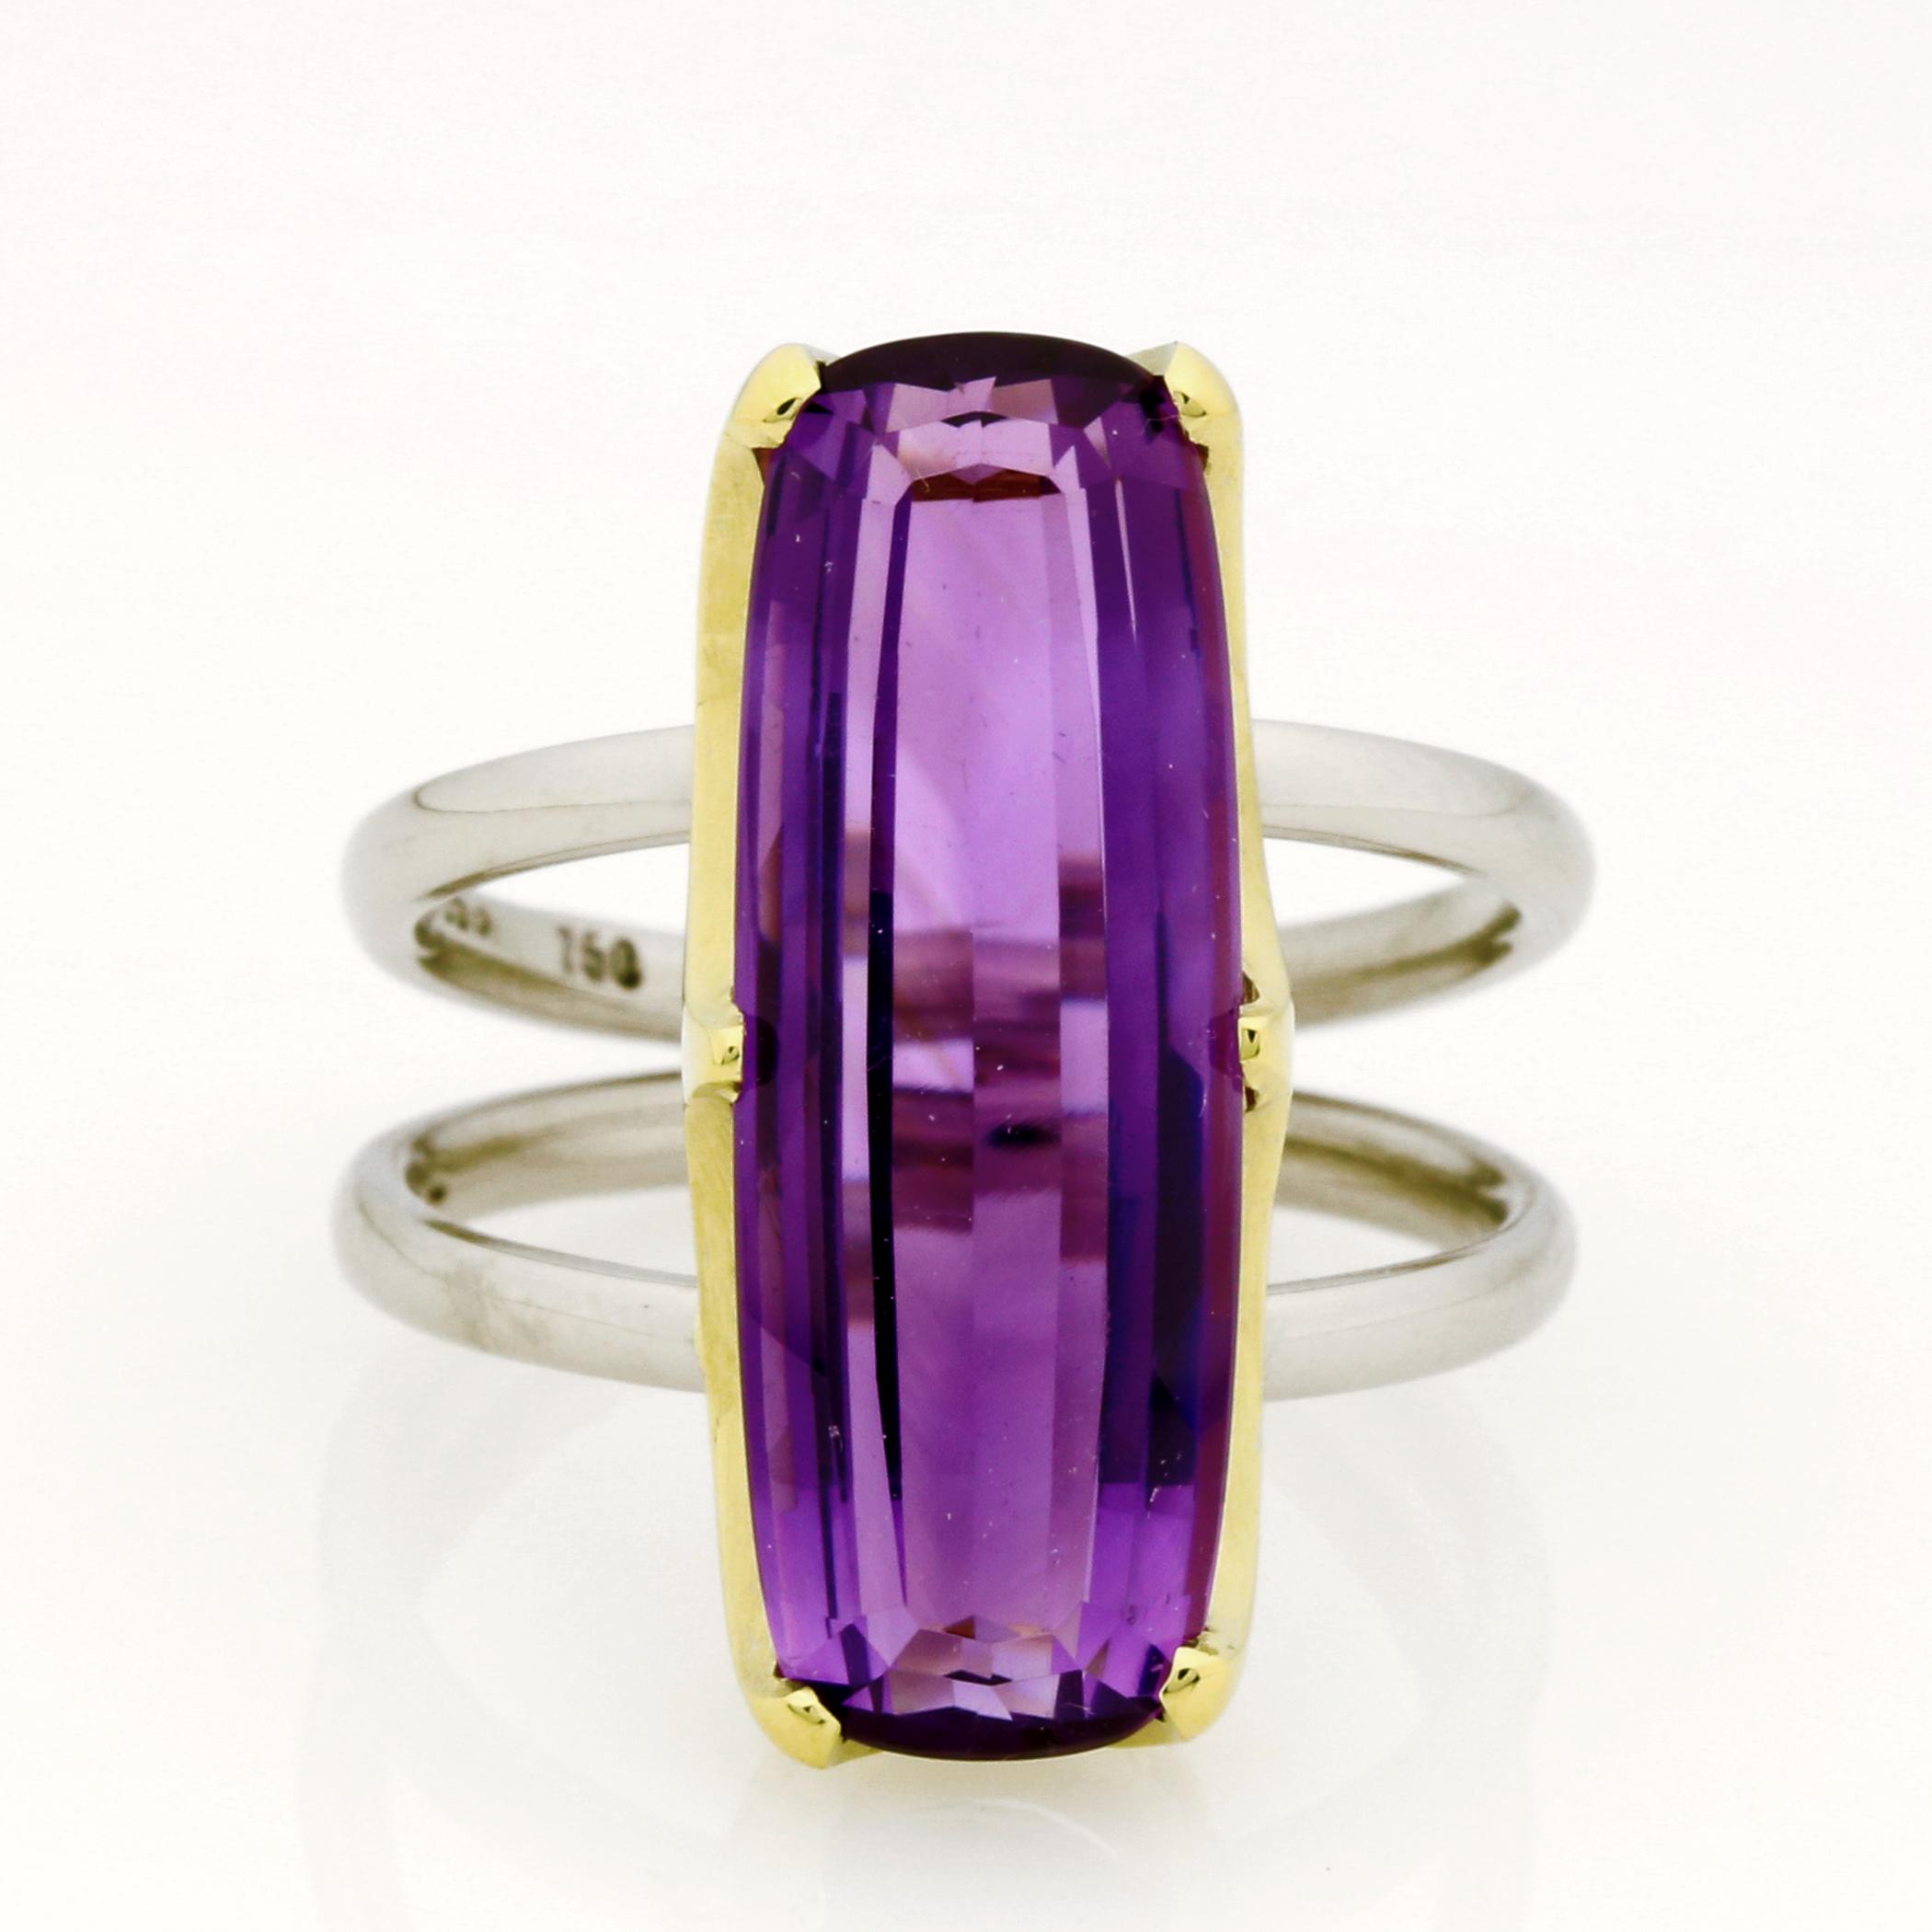 Ladies handmade 18ct  Green gold and Palladium, Amethyst dress ring.